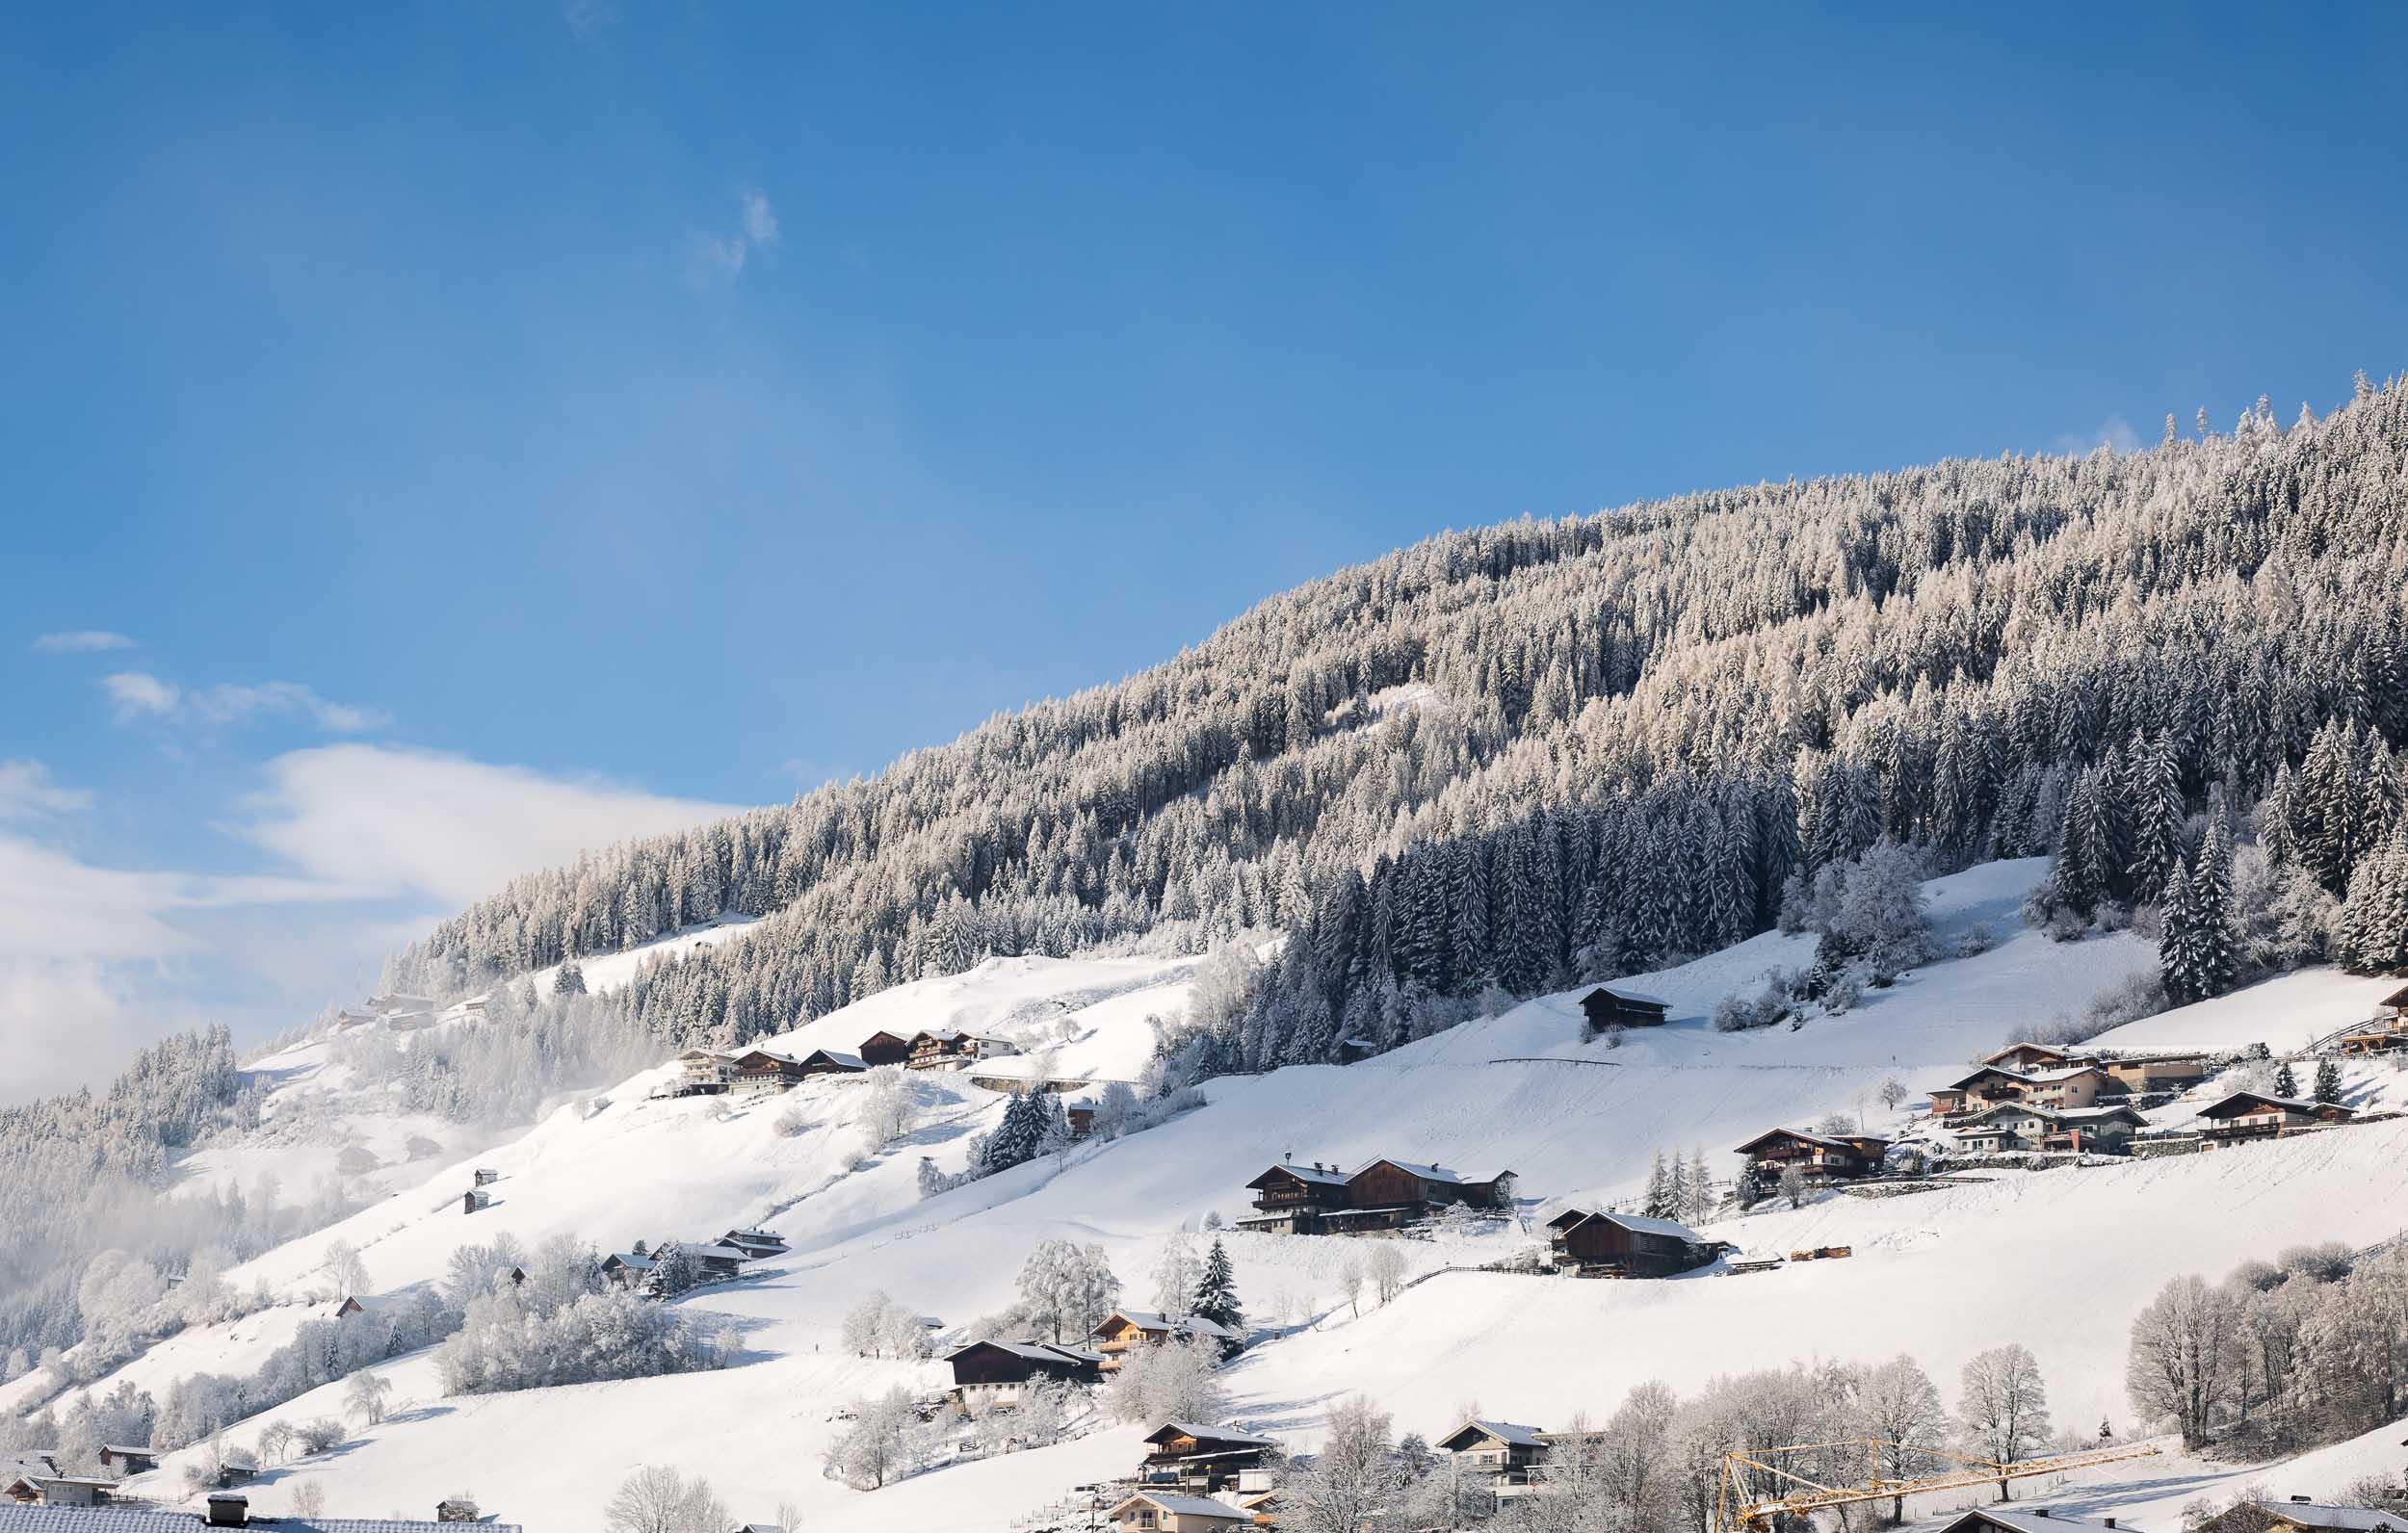 austria mountain vista midday sun landscape.jpg